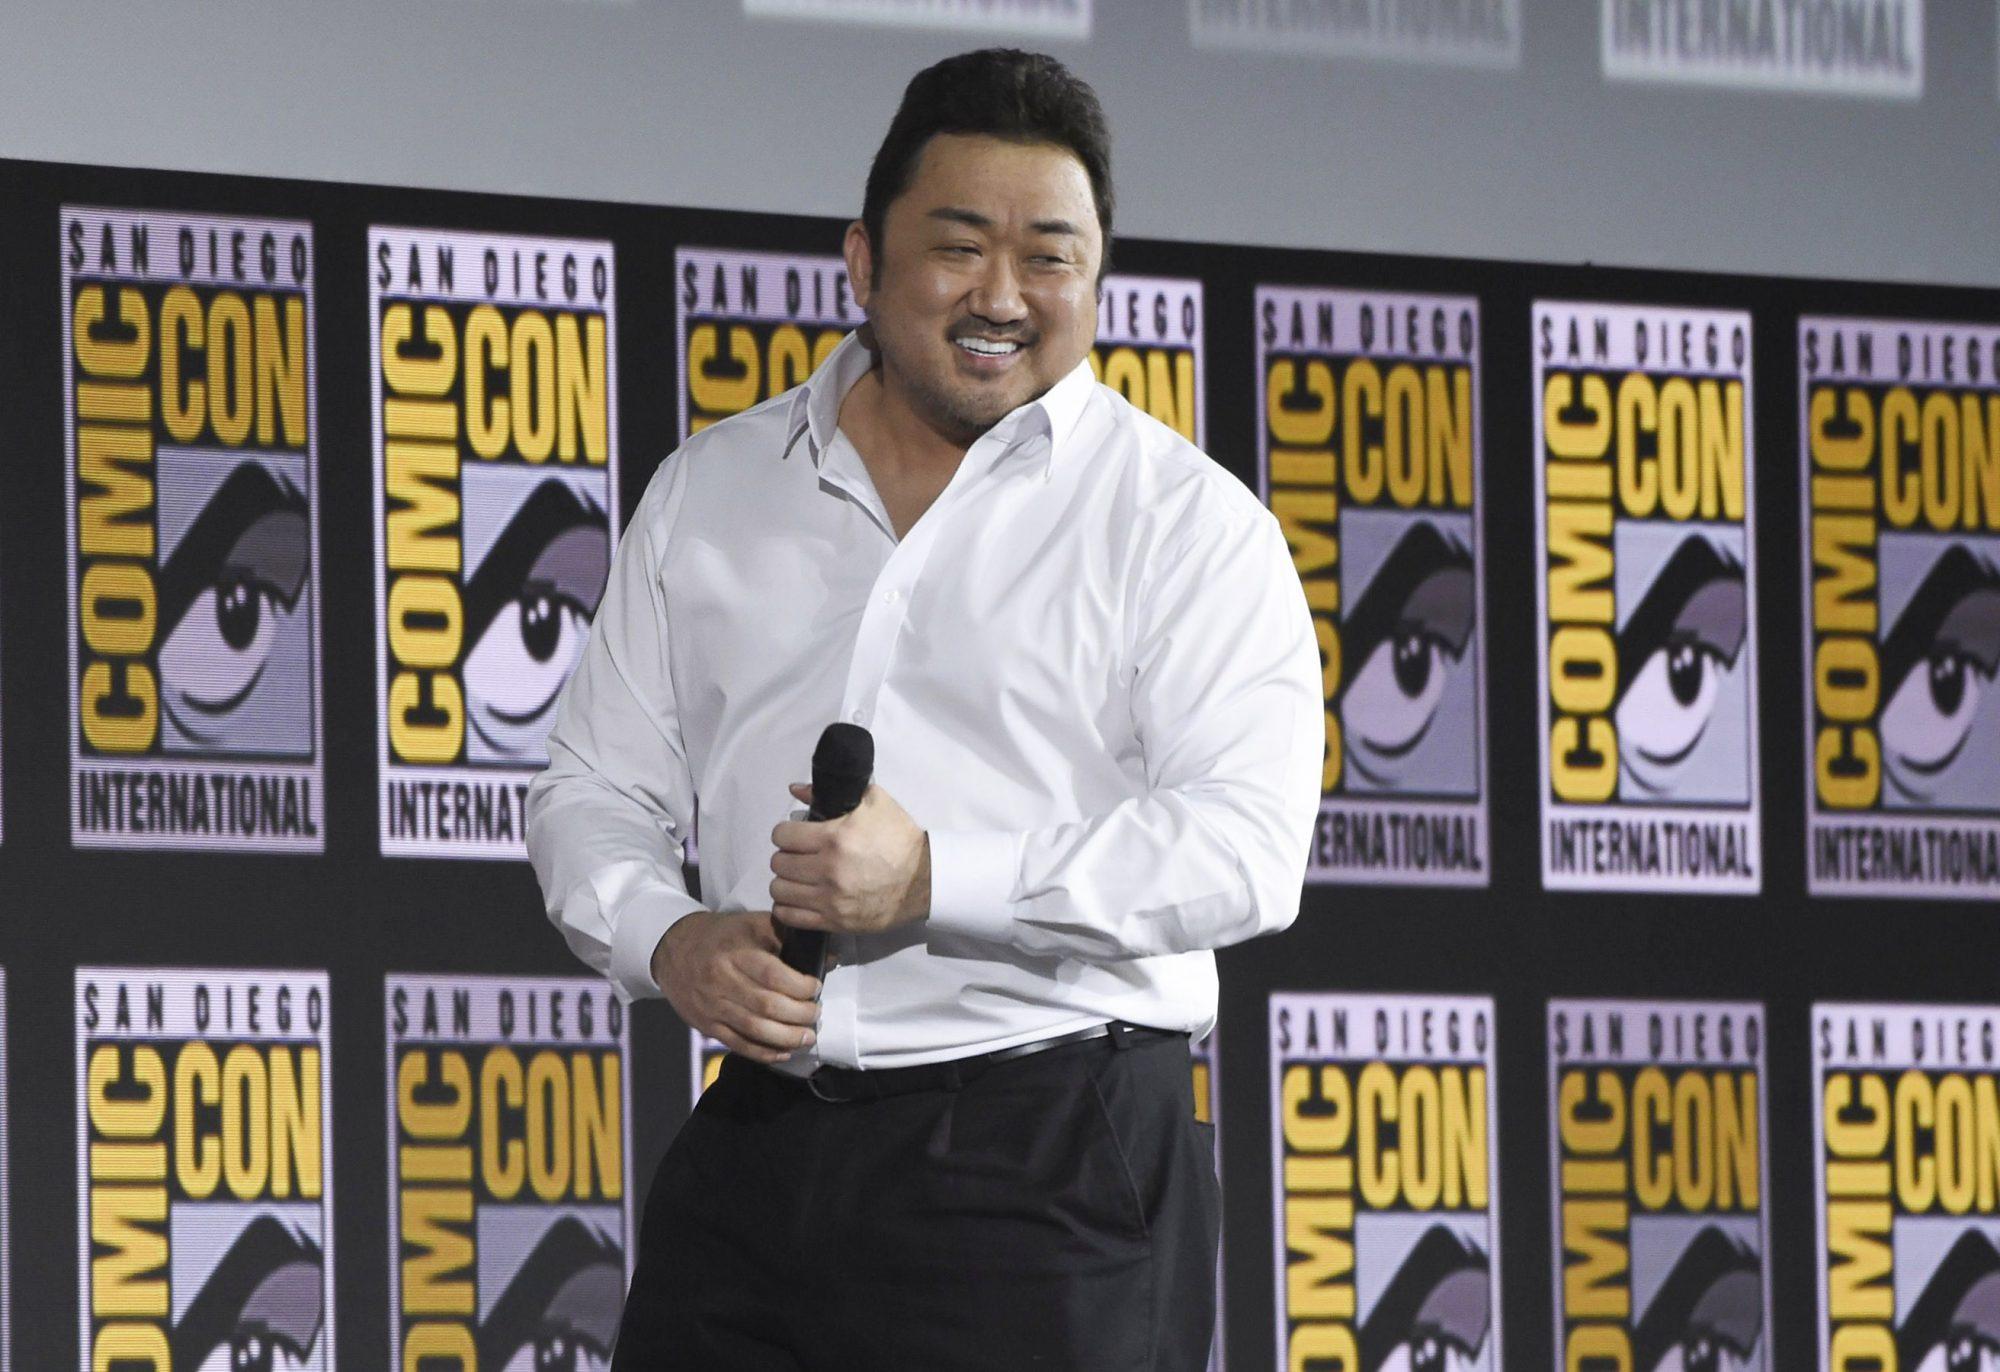 2019 Comic-Con - Marvel Studios, San Diego, USA - 20 Jul 2019